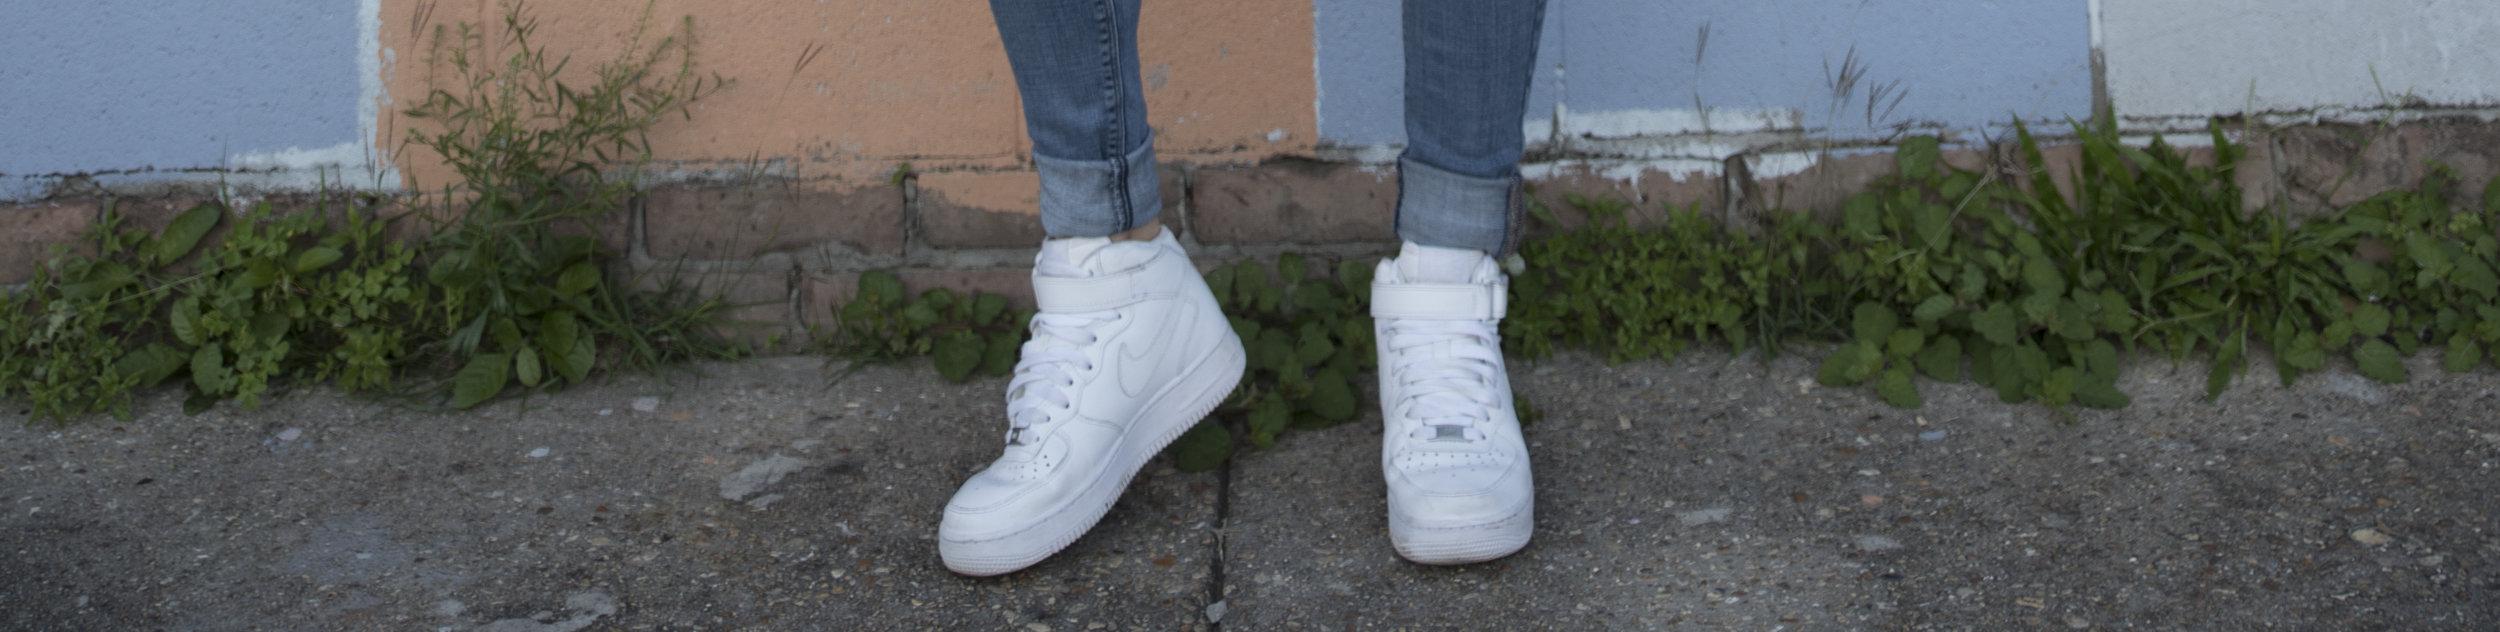 Shoes CLose up.jpg